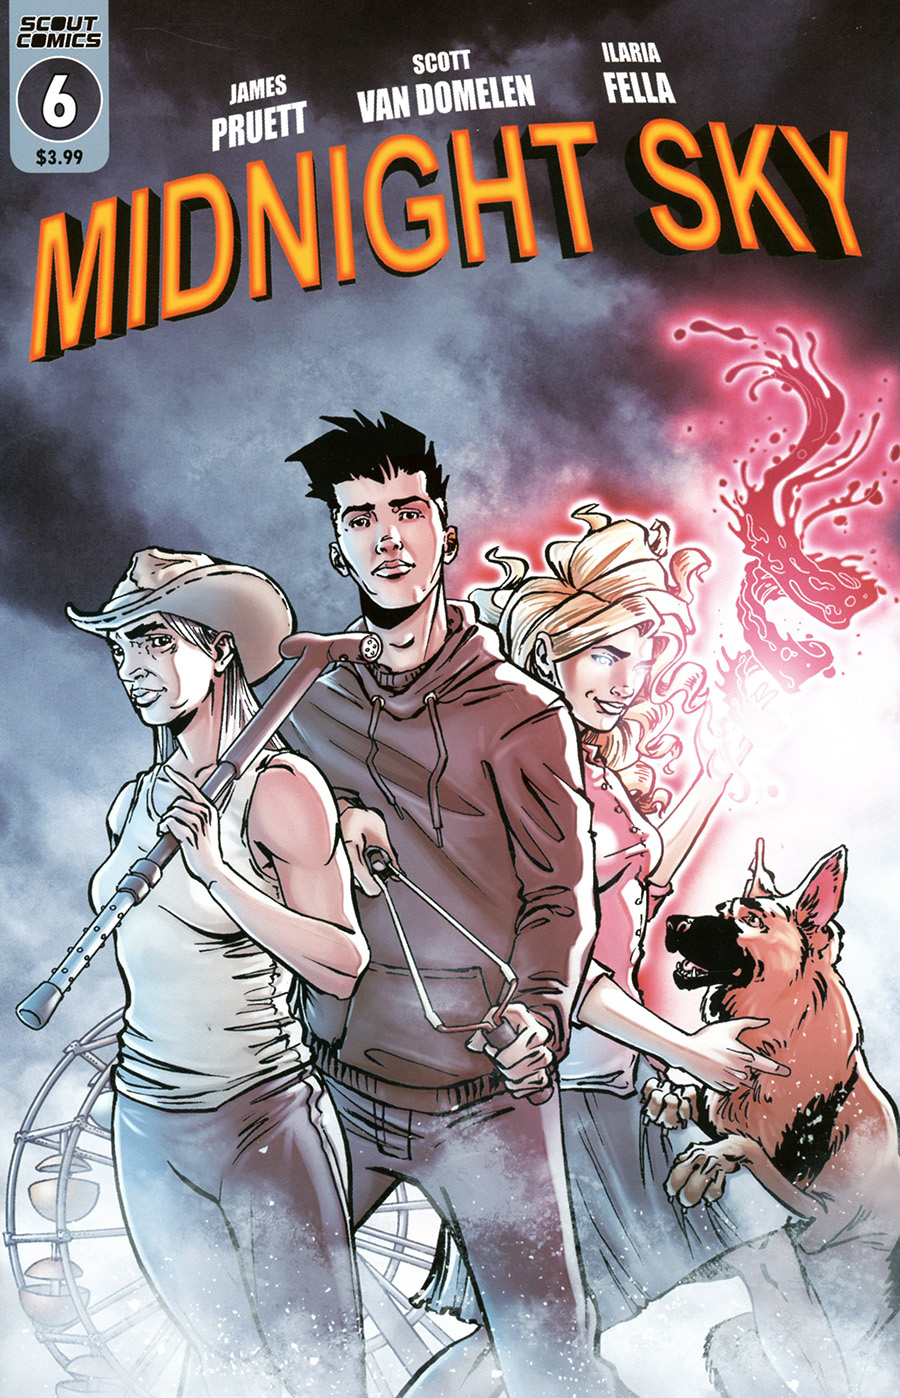 Midnight Sky #6 Cover B Variant Scott Van Domelen Zombieland Homage Cover